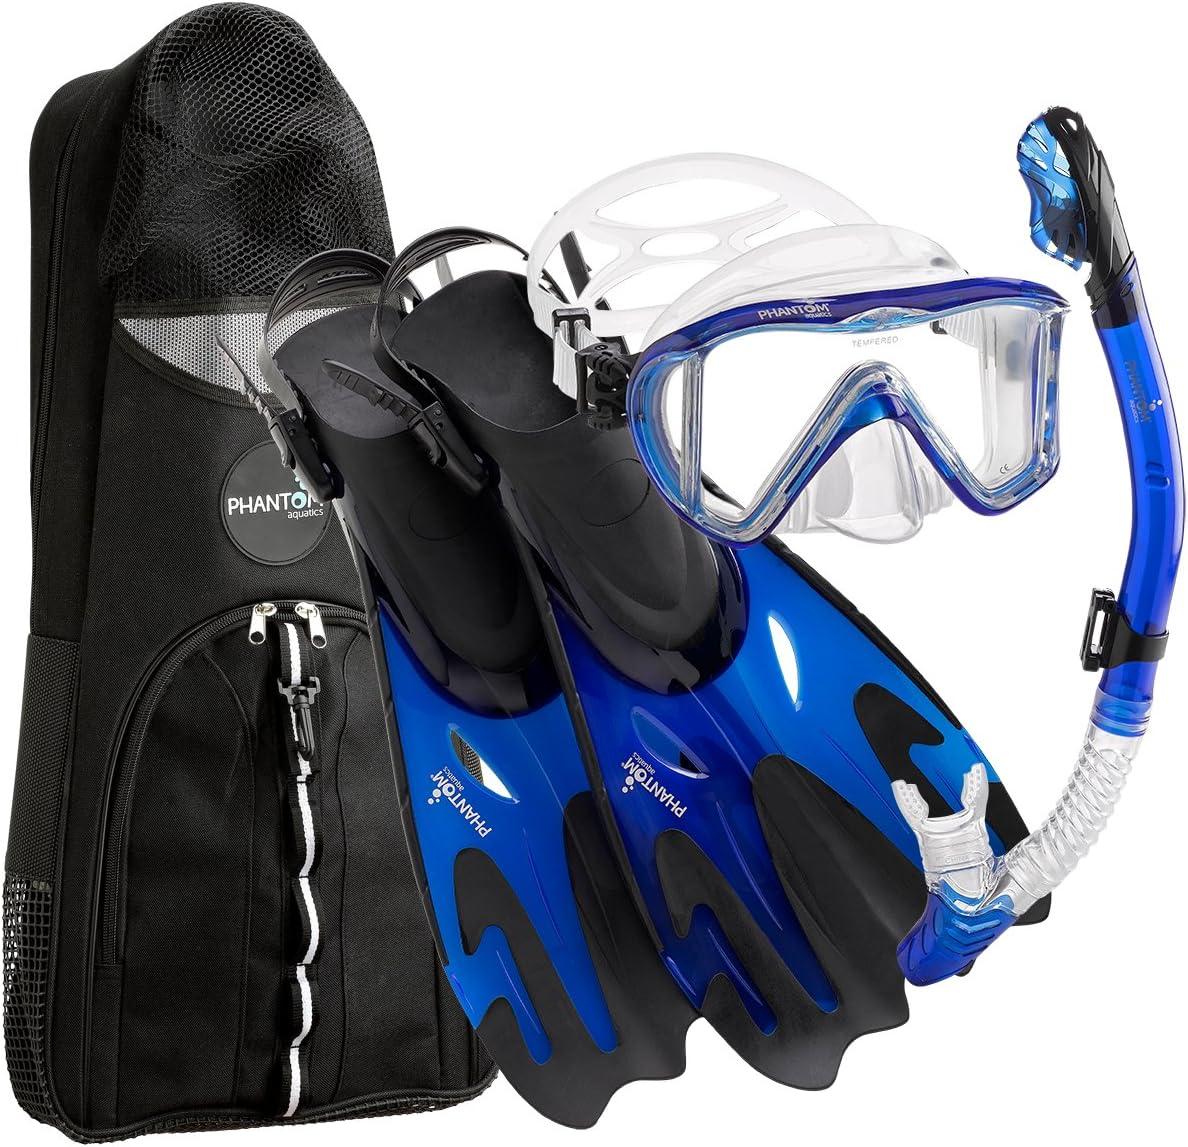 Phantom Aquatics Legendary Mask Fin Snorkel Set with Mesh Bag